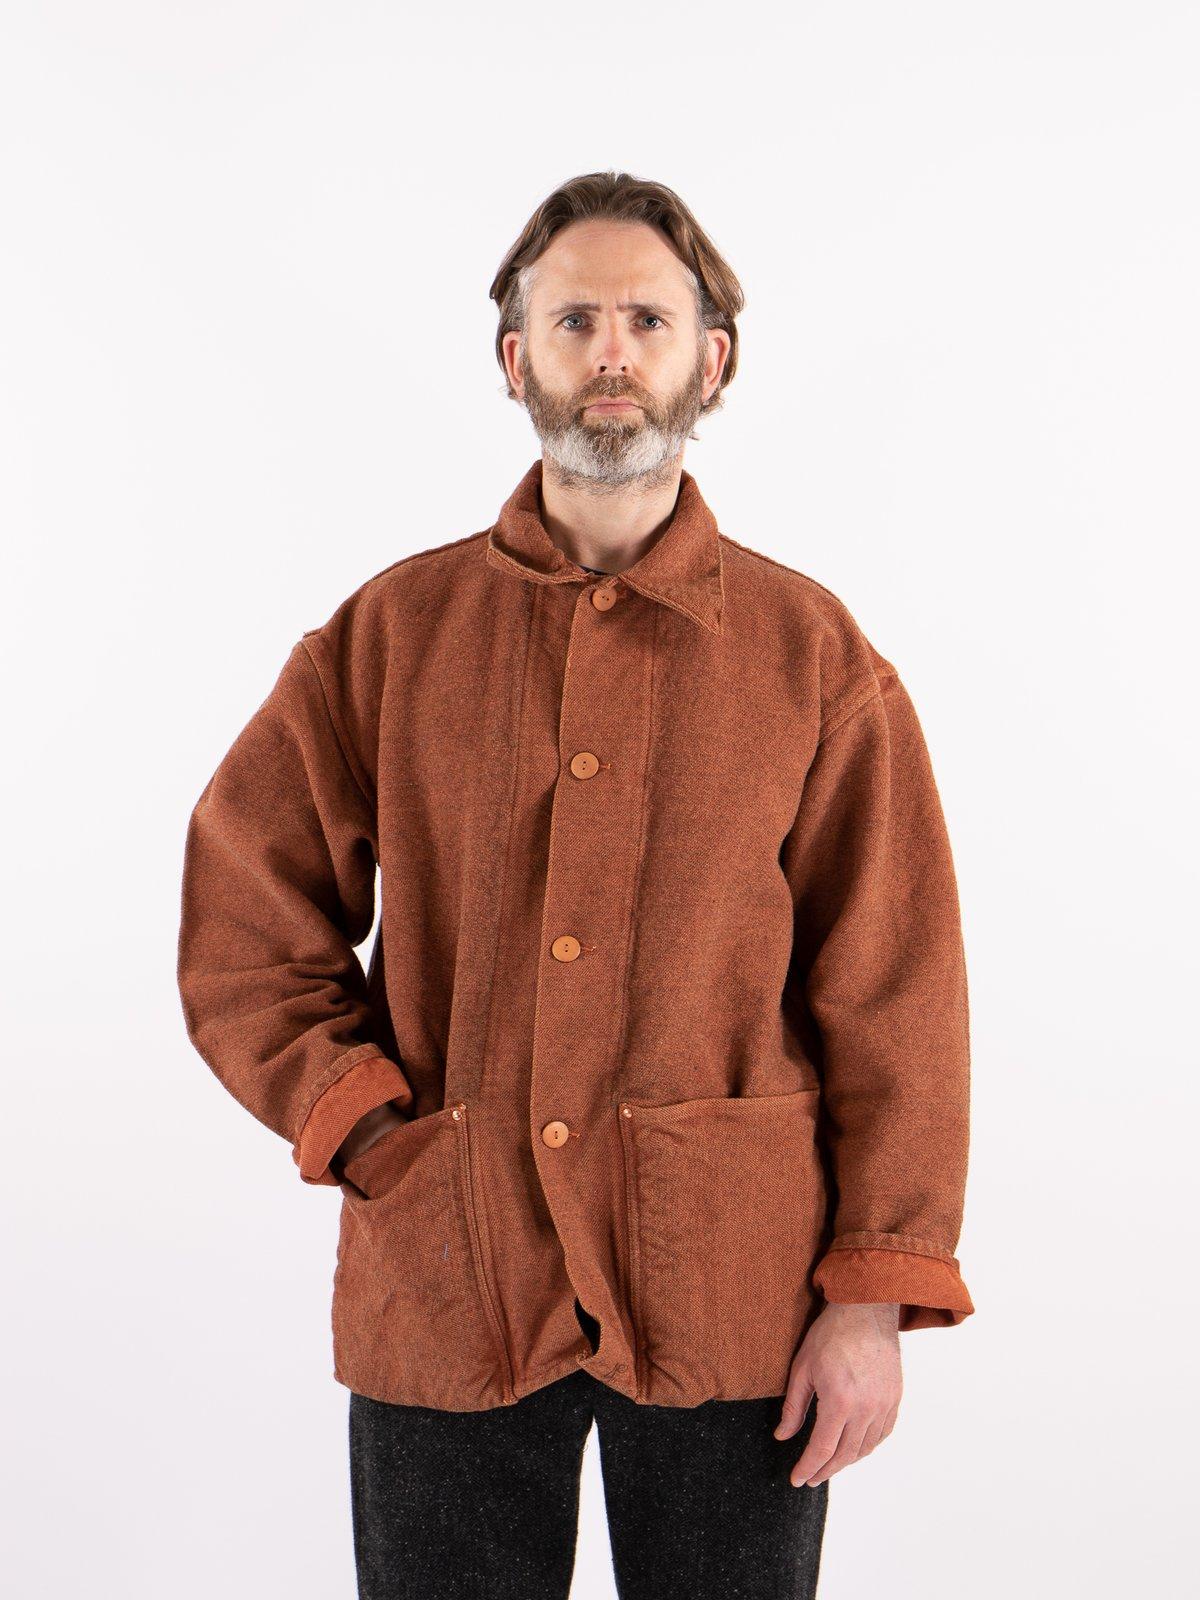 Red Ochre Dye Collared Shepherd's Coat - Image 2